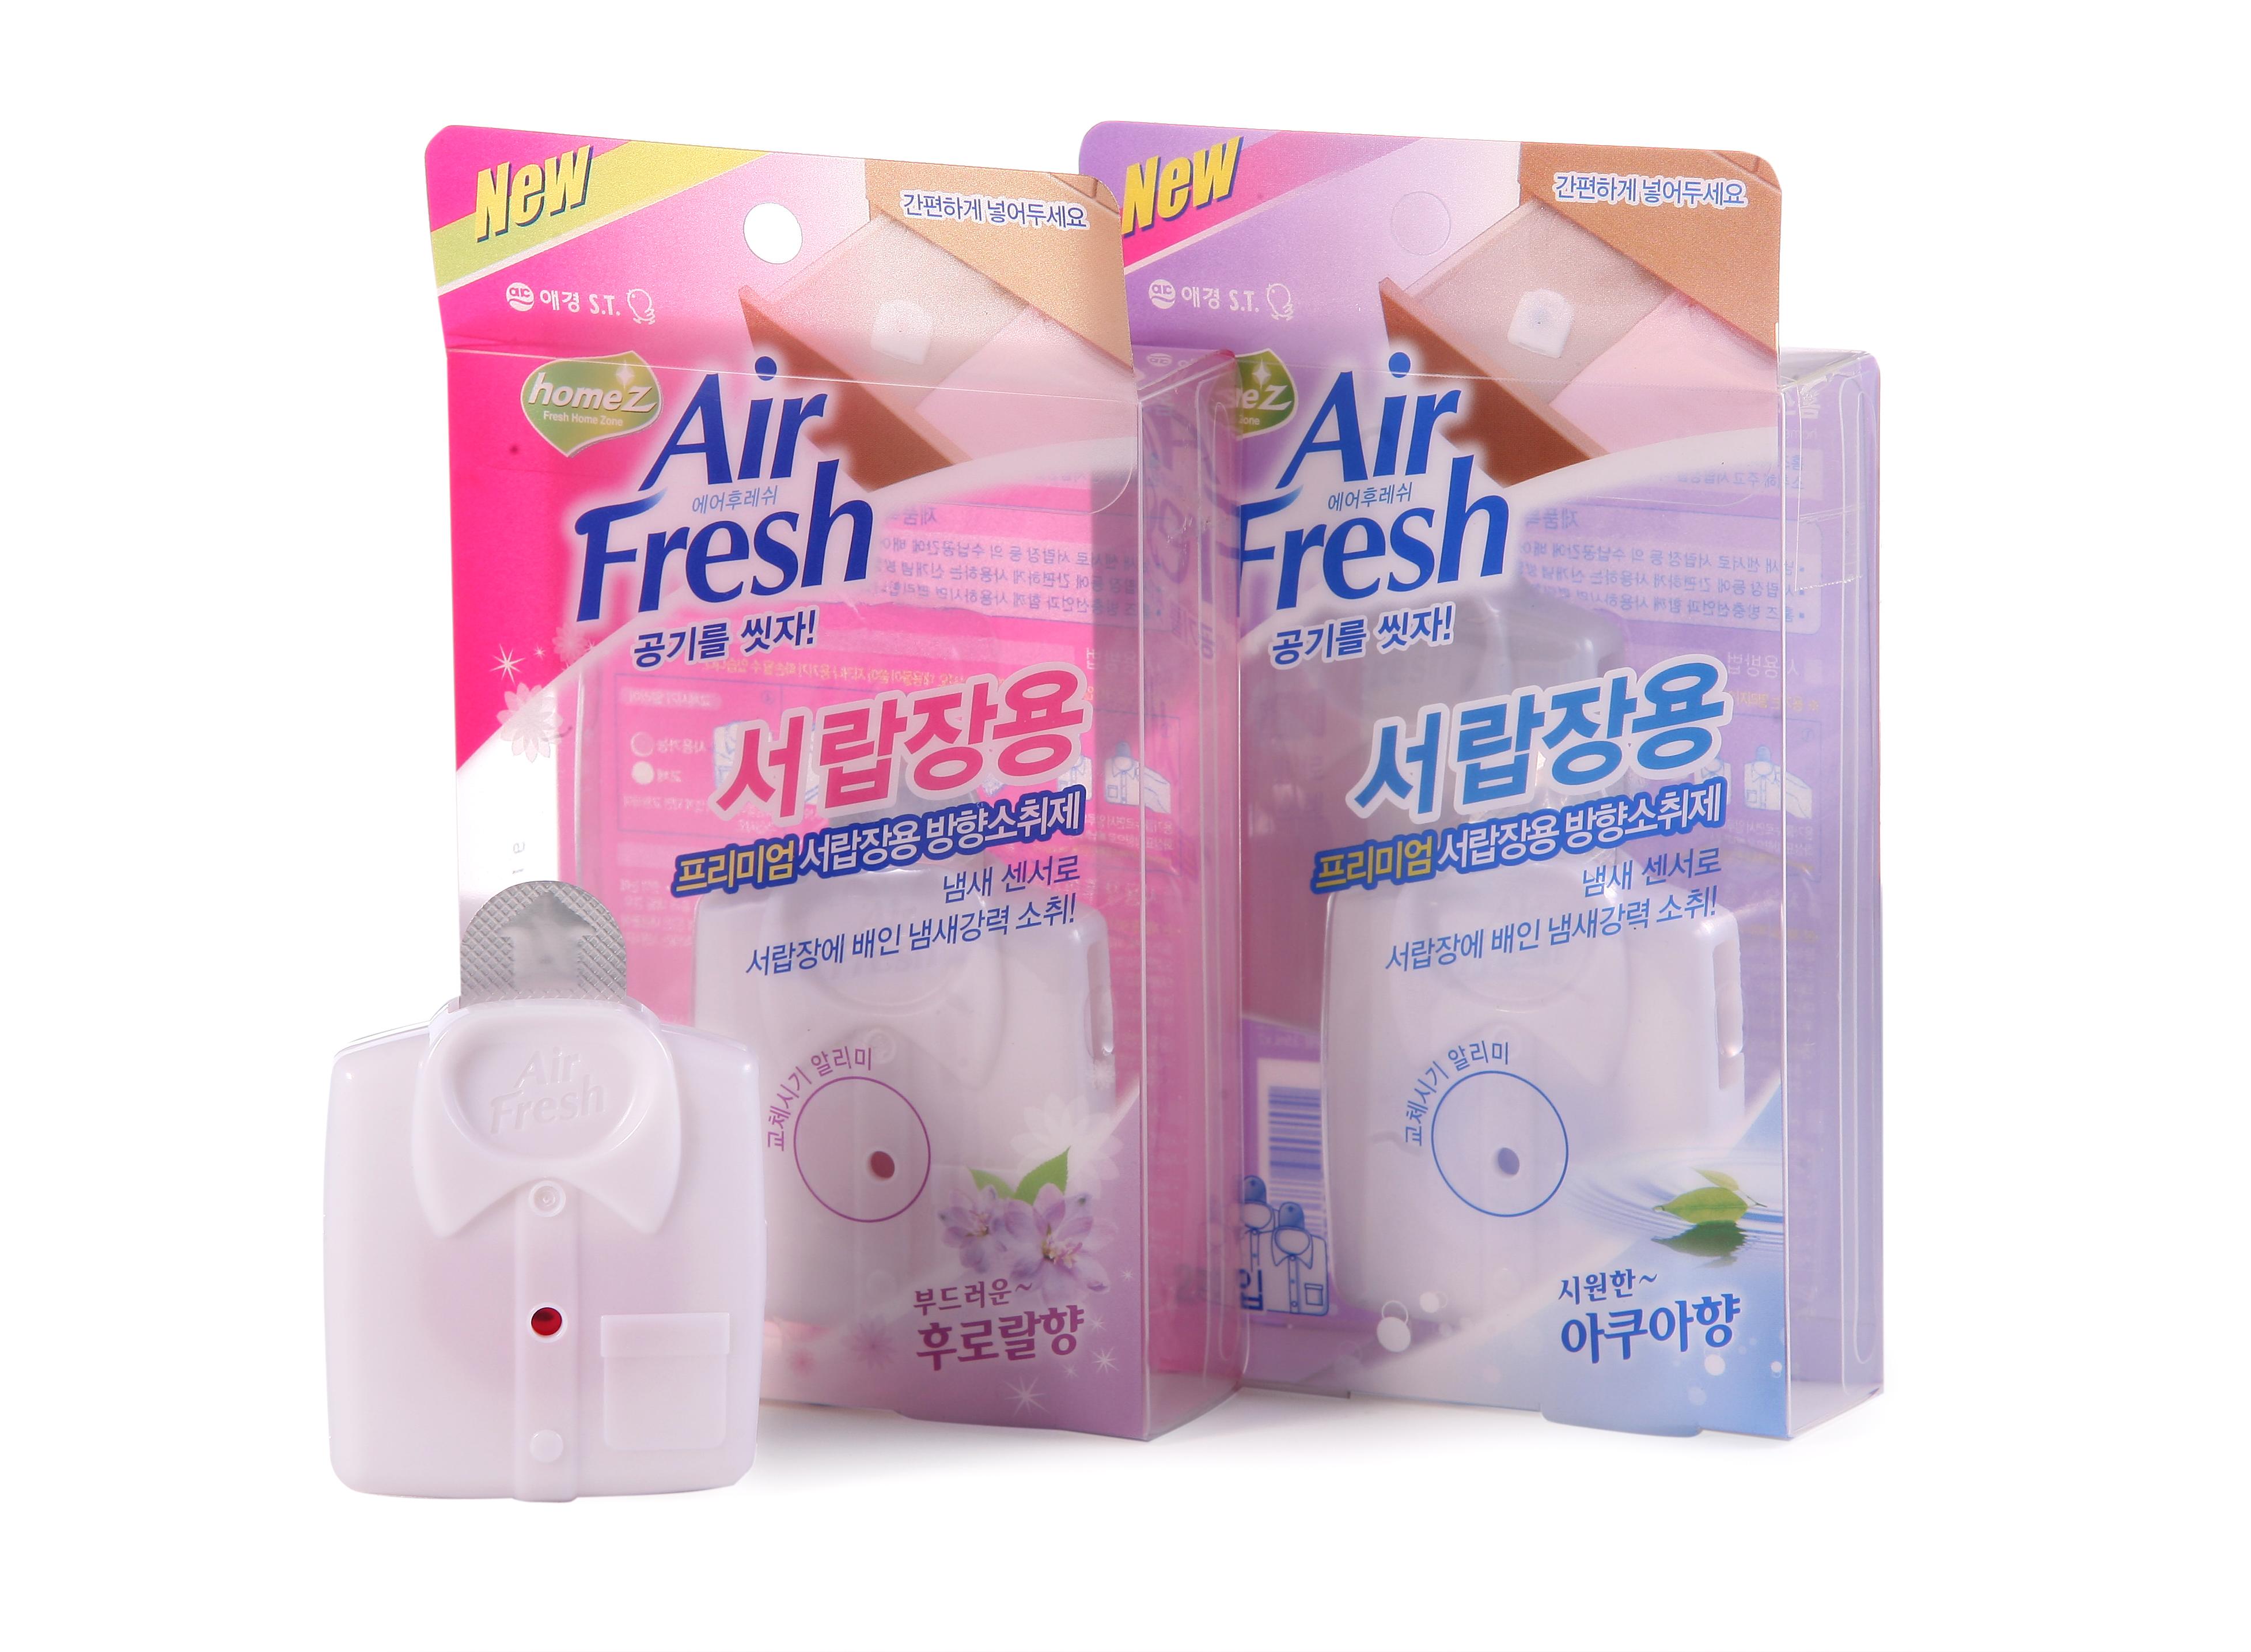 [Aekyung ST]HOMEZ Air Fresh Drawer Deodorizer